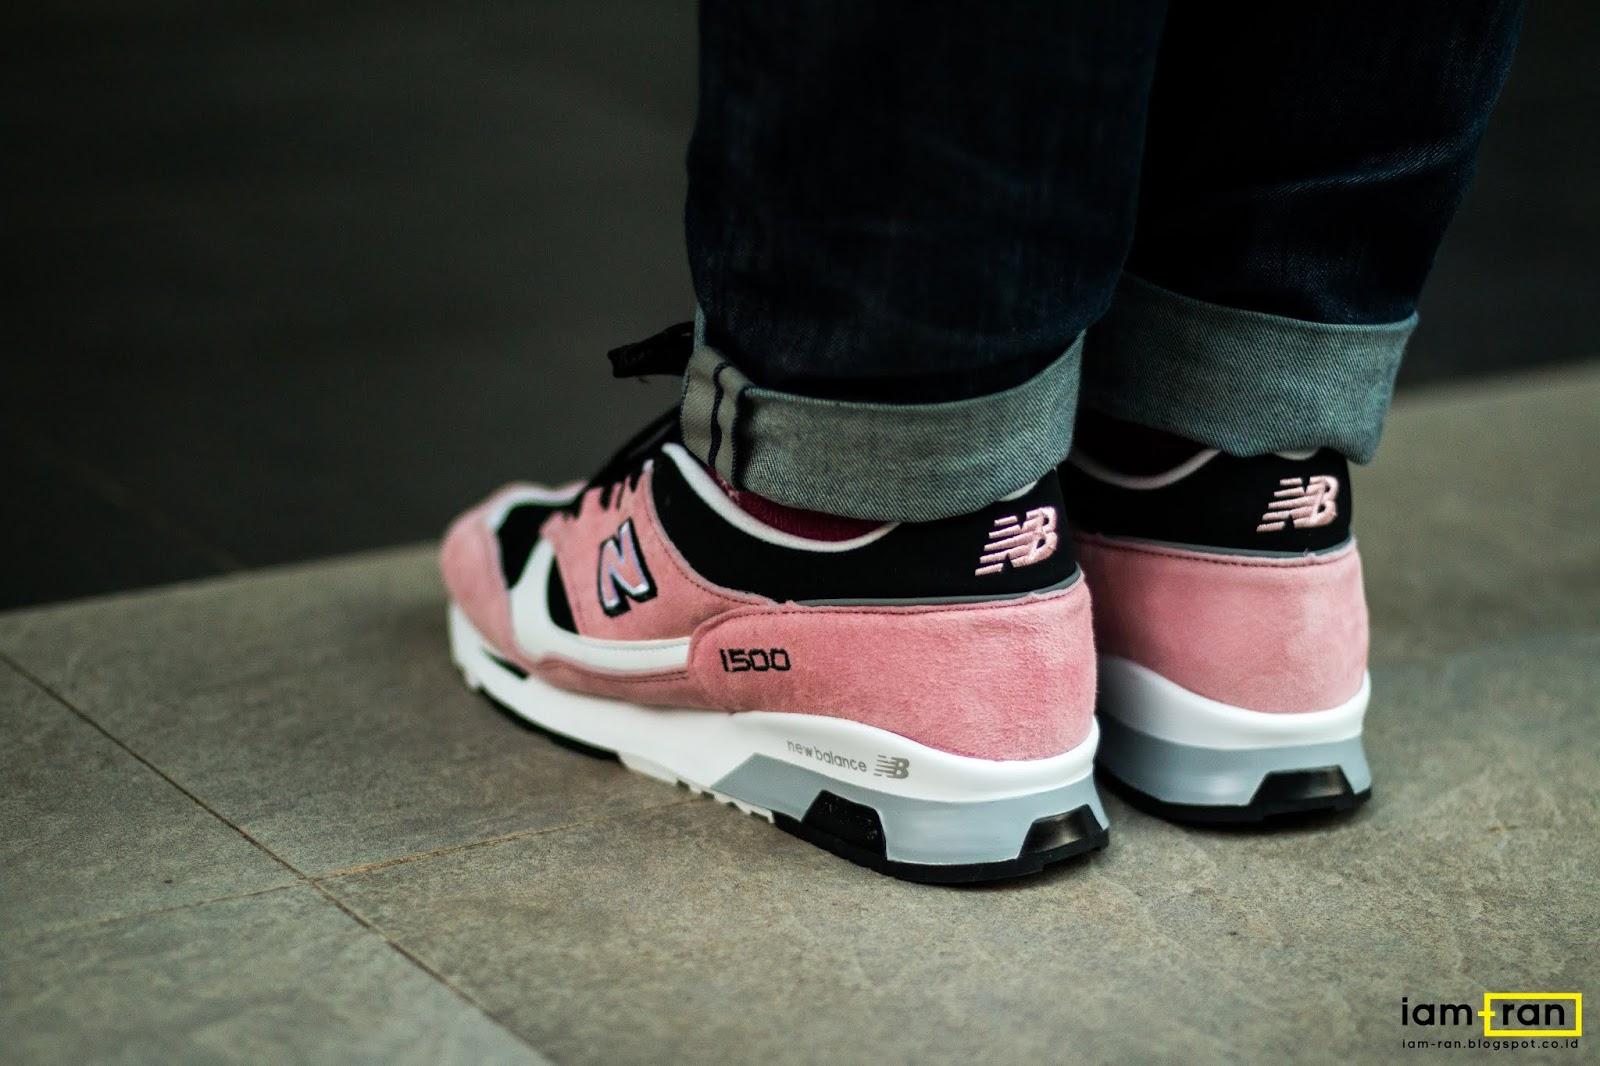 best authentic 604ab 7b652 ON FEET   Ryan - NB 1500 MPK  Pastel Pink Easter Pack. Ryan on feet.  Sneakers   NB 1500 MPK  Pastel Pink Easter Pack